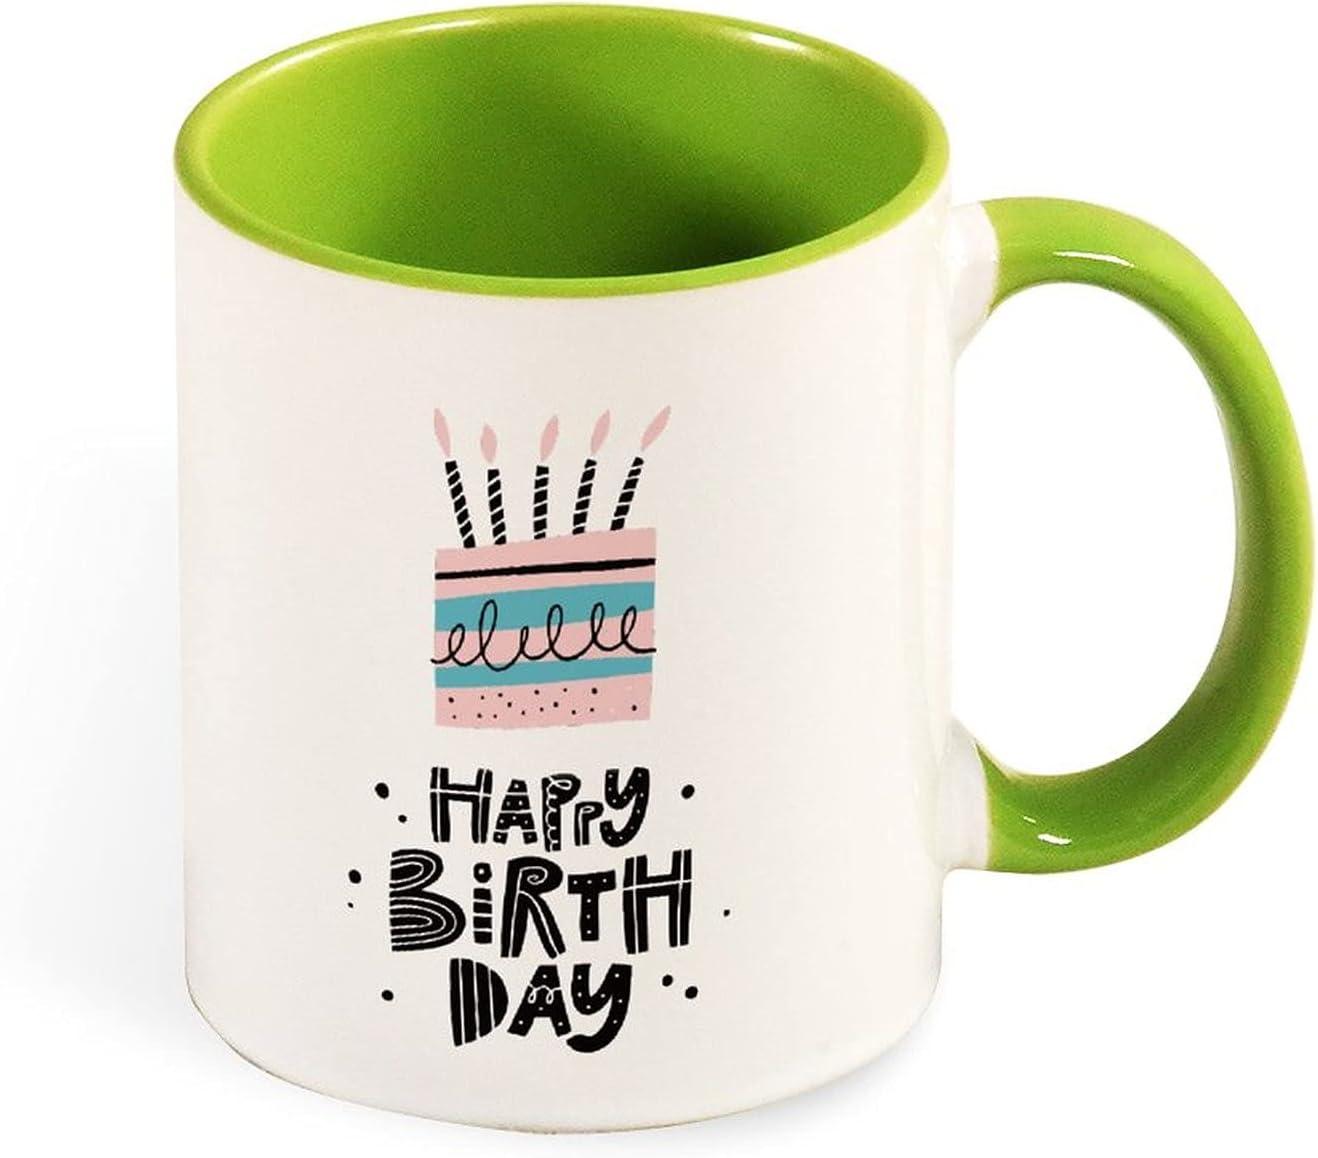 Ceramic coffee cup for cappuccino Max 80% OFF latte Happy tea Birth or Superior hot